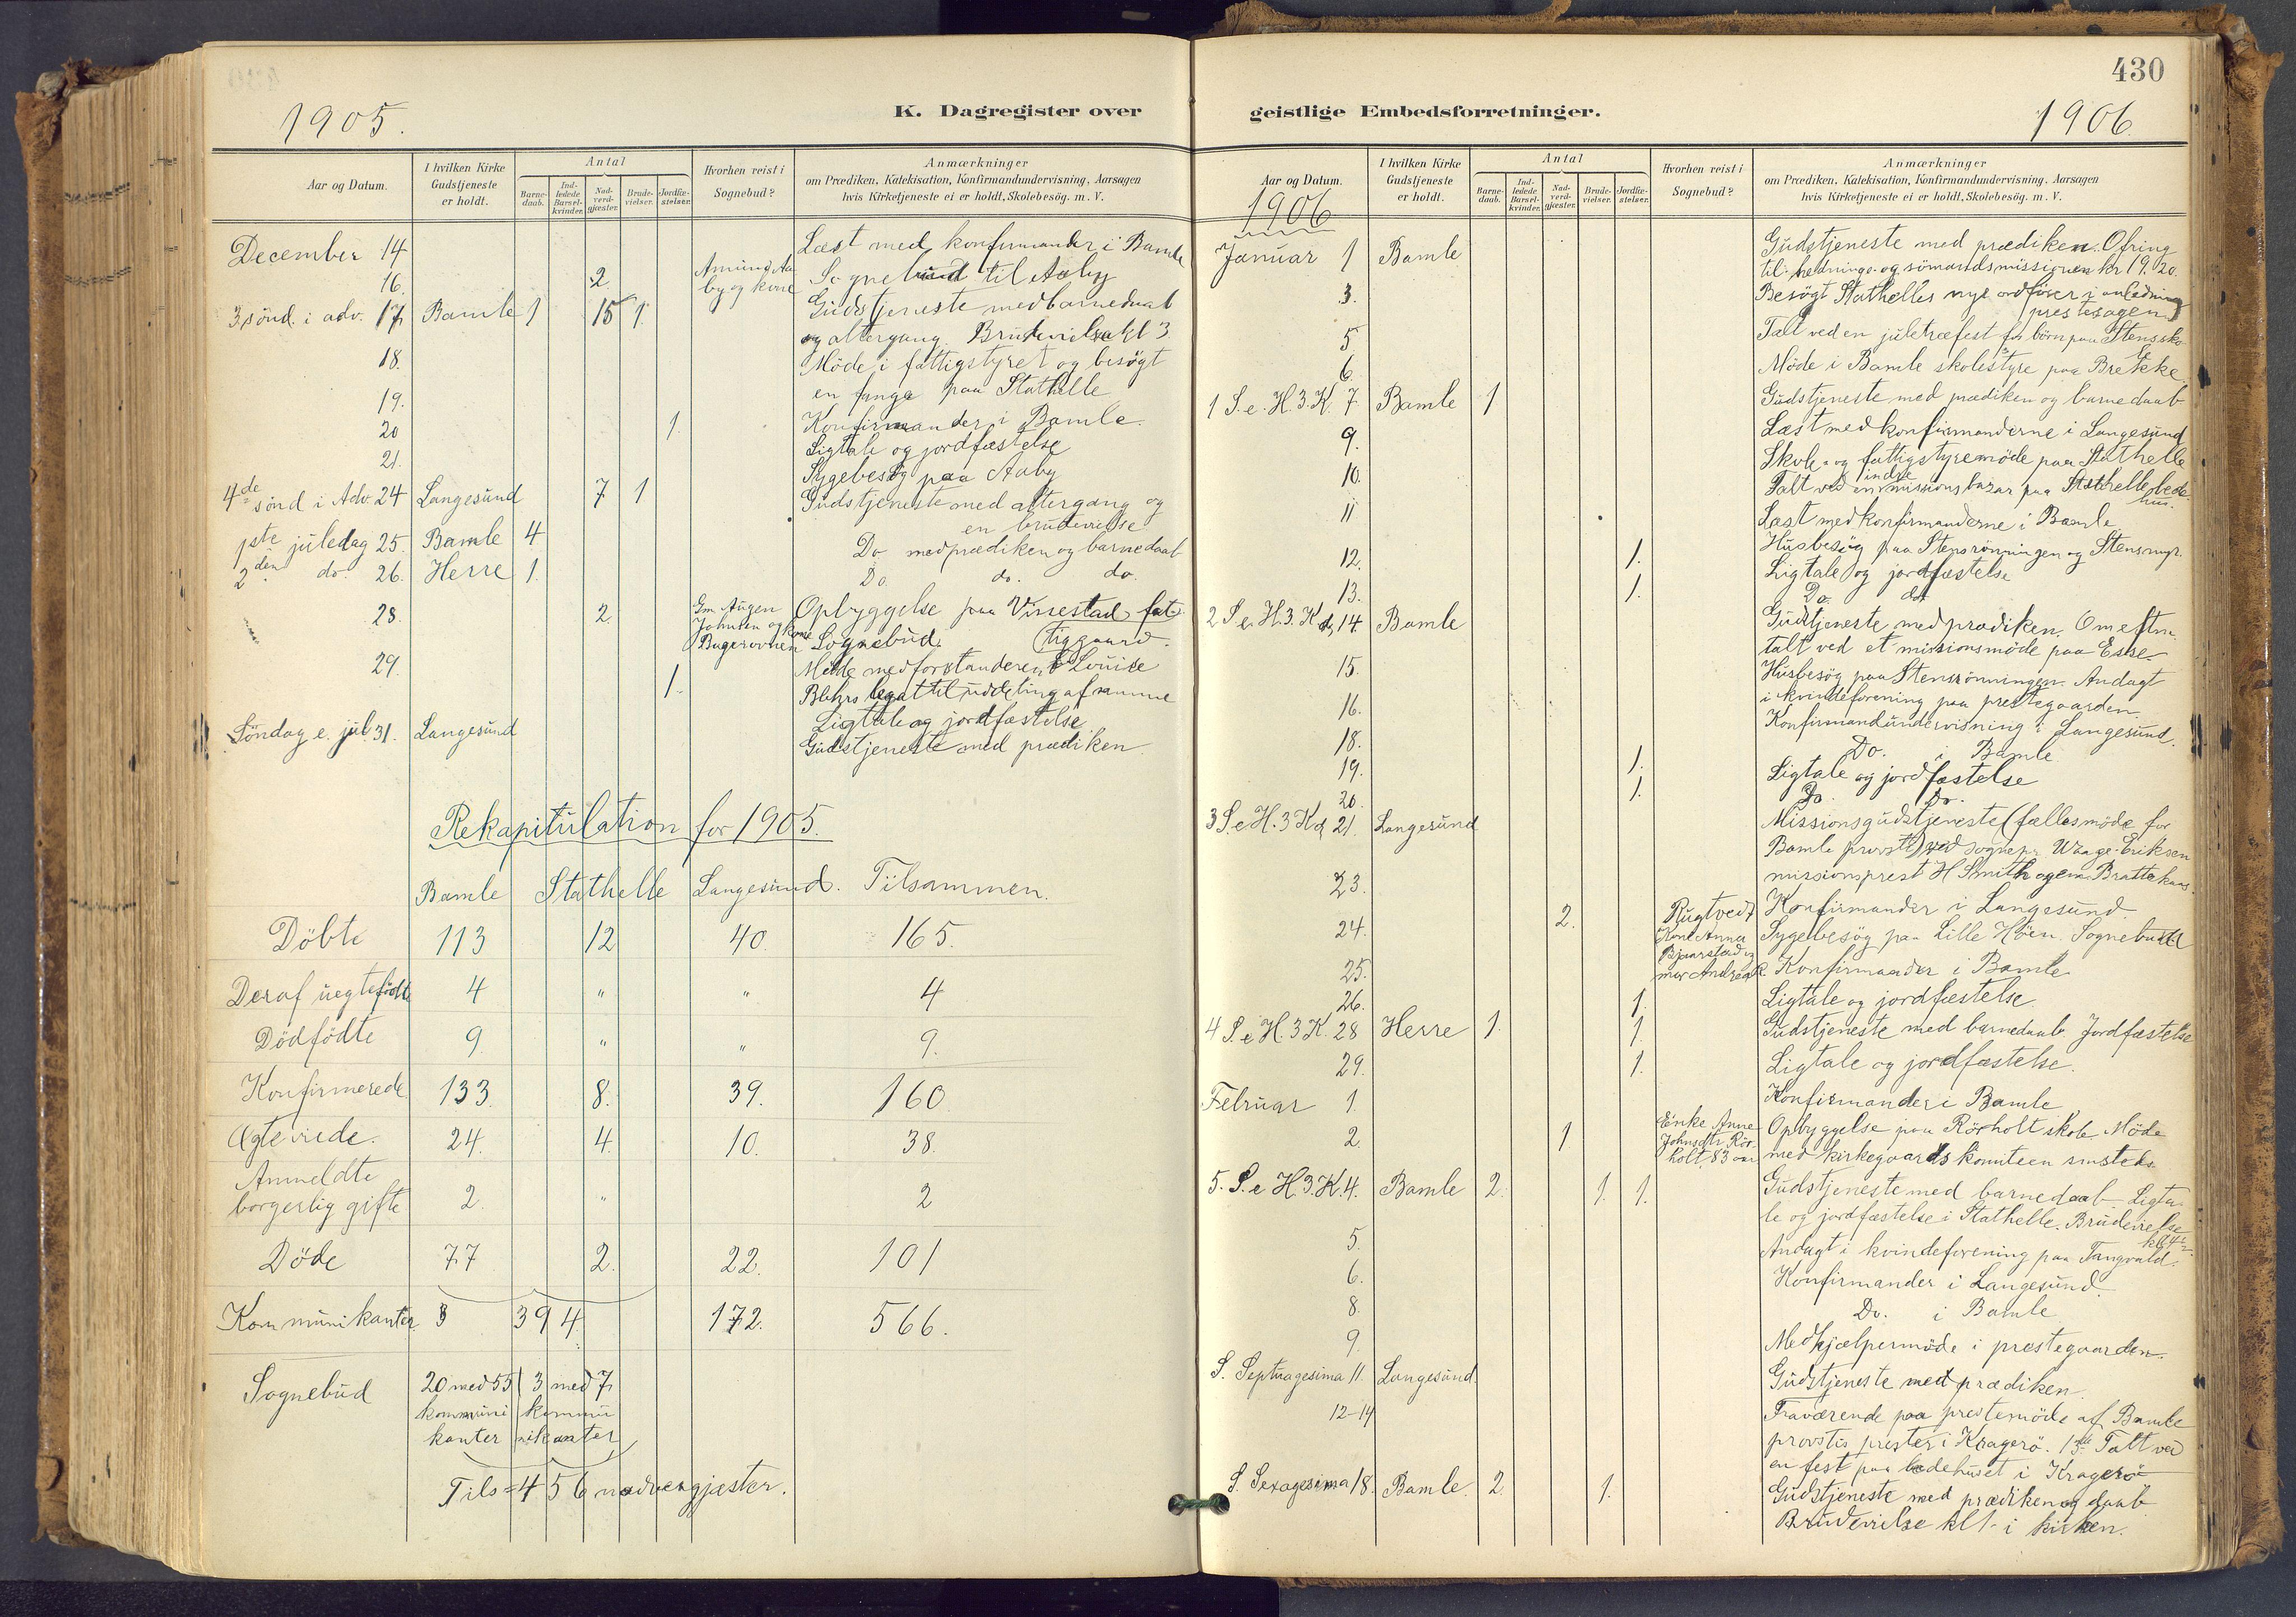 SAKO, Bamble kirkebøker, F/Fa/L0009: Ministerialbok nr. I 9, 1901-1917, s. 430